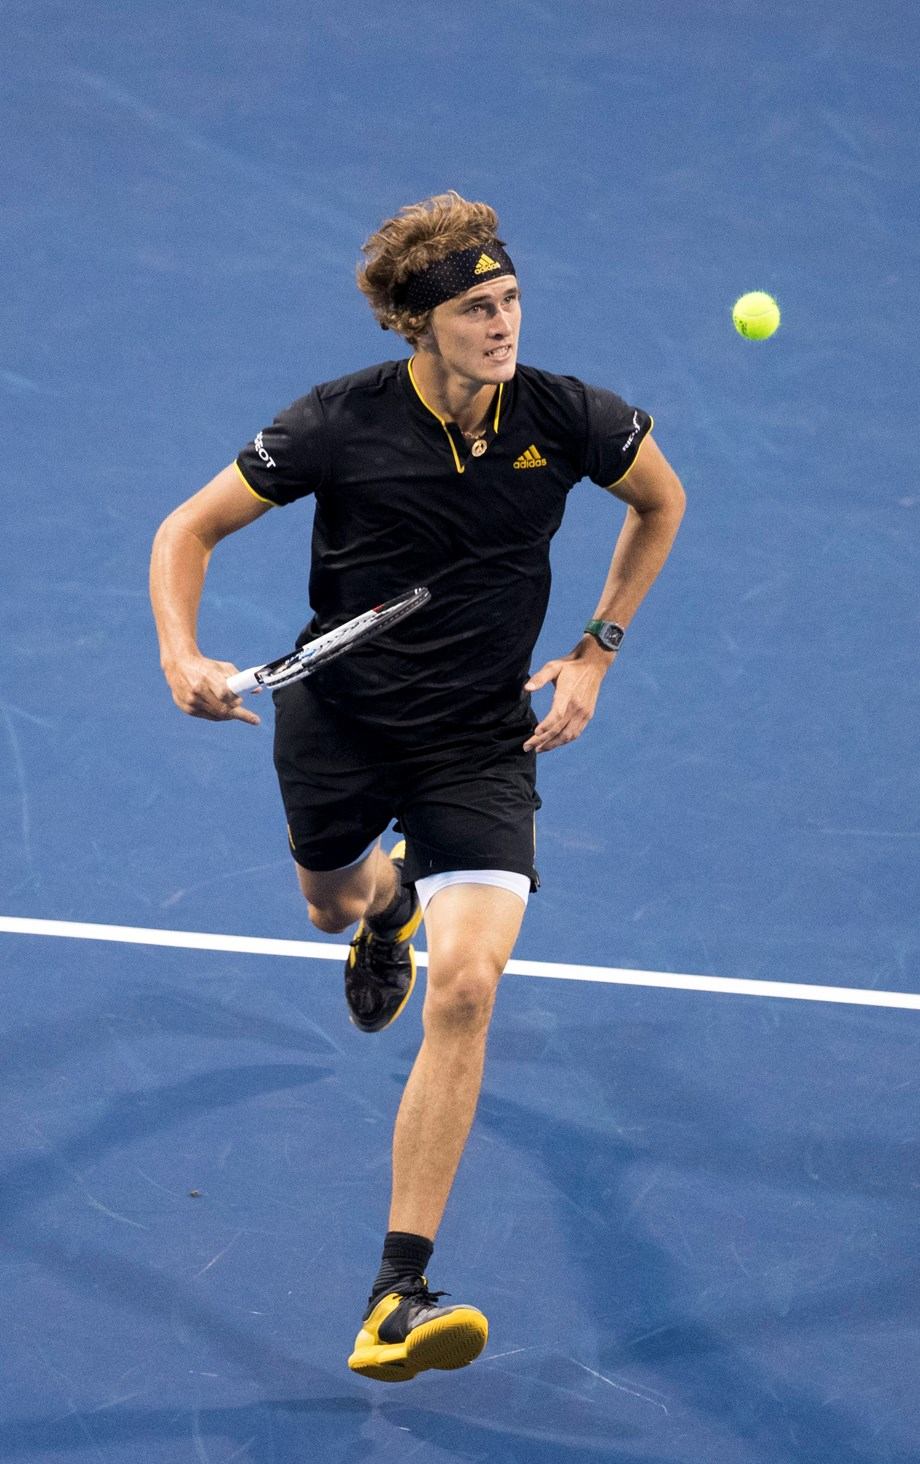 Zverev stunned by Brown in grass-court opener